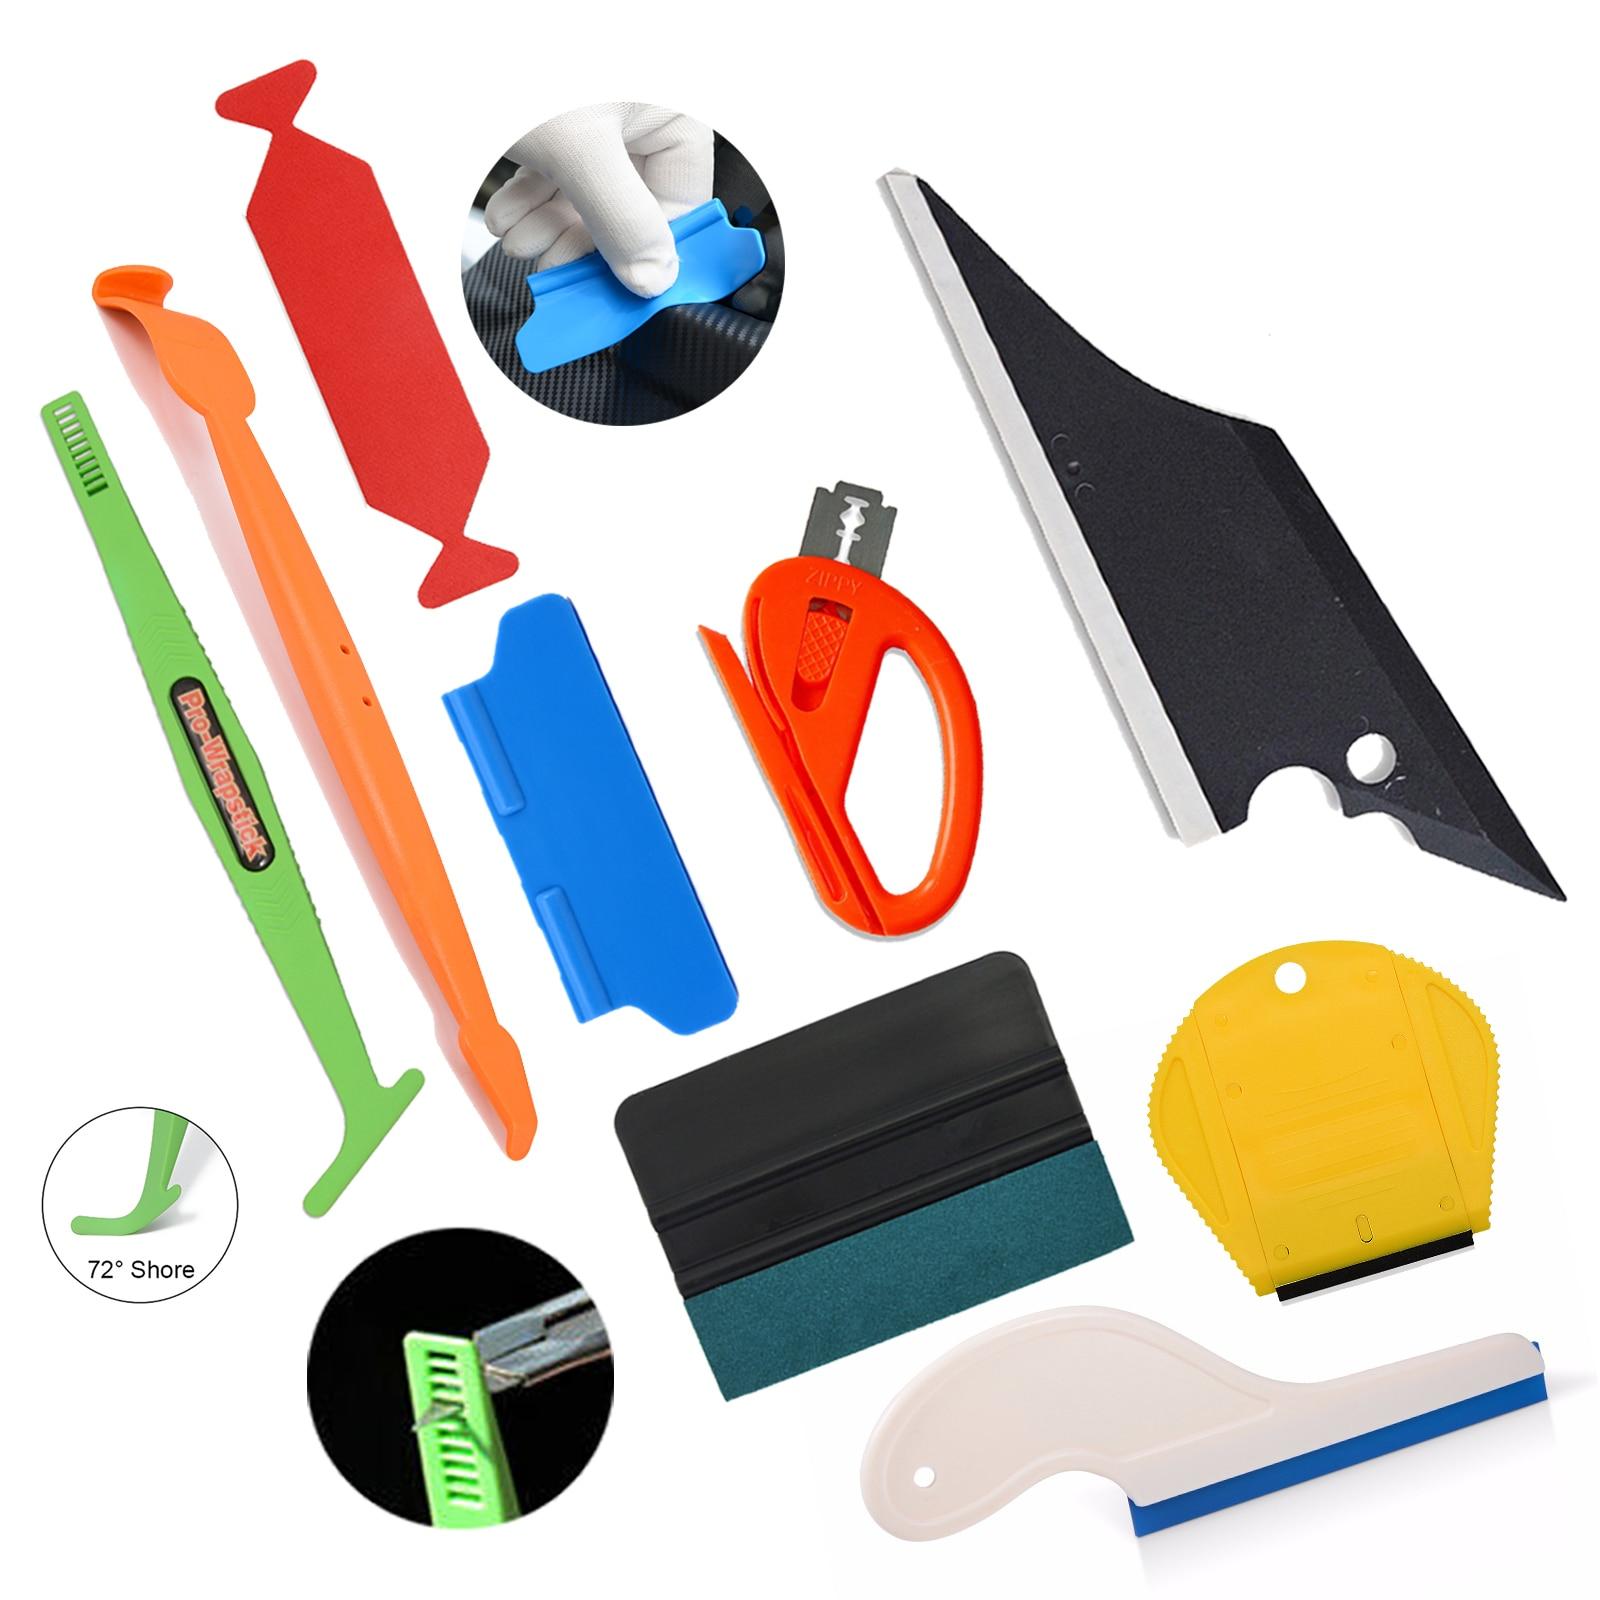 EHDIS, rascador de película de fibra de carbono, escurridor magnético, envoltura de vinilo, cortador, cuchilla, Estilismo, herramienta, Kit de tinte de Ventanilla, juego de accesorios para coche